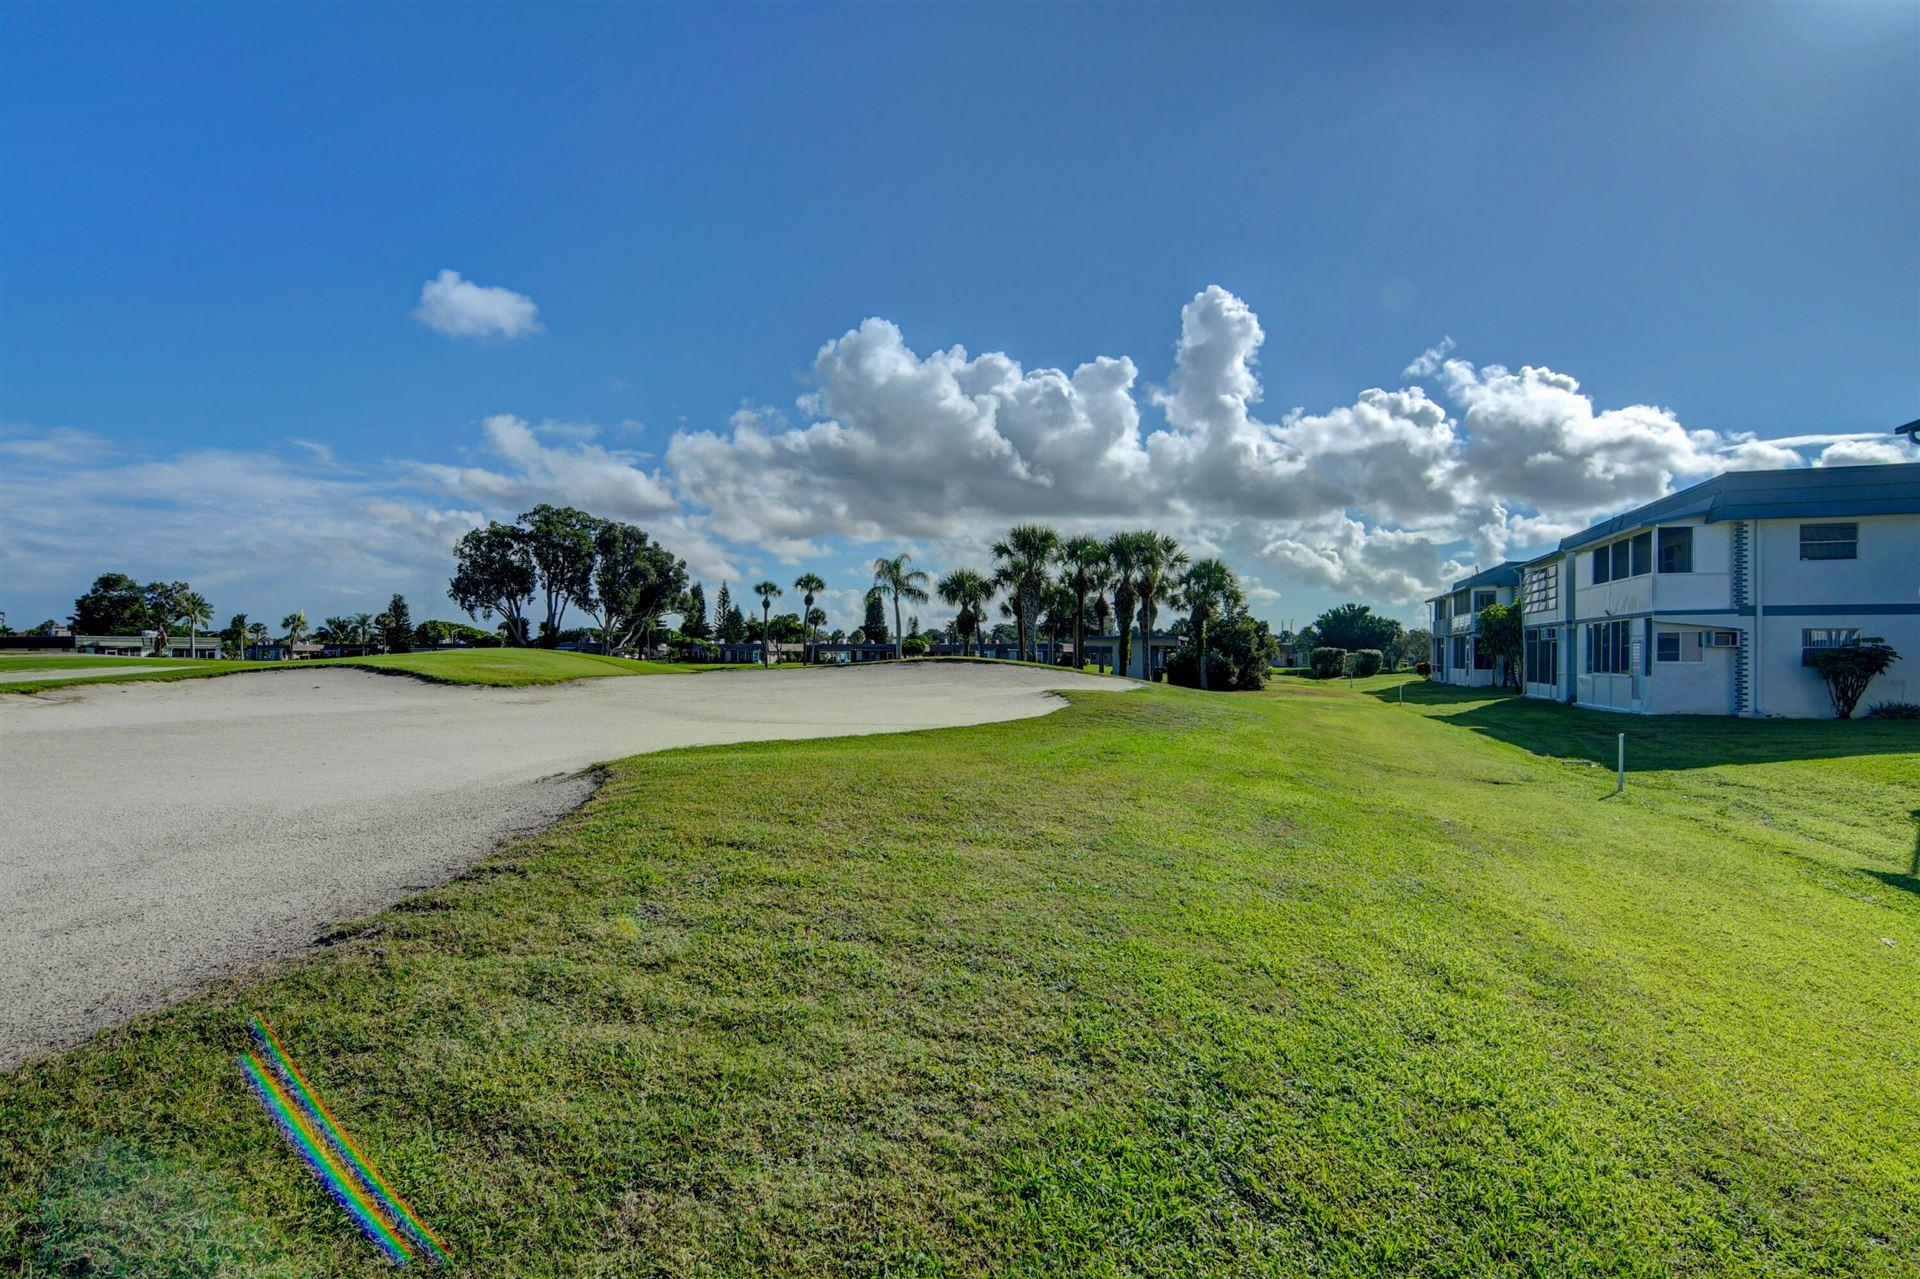 352 Tuscany G, Delray Beach, FL 33446 - MLS#: RX-10751783